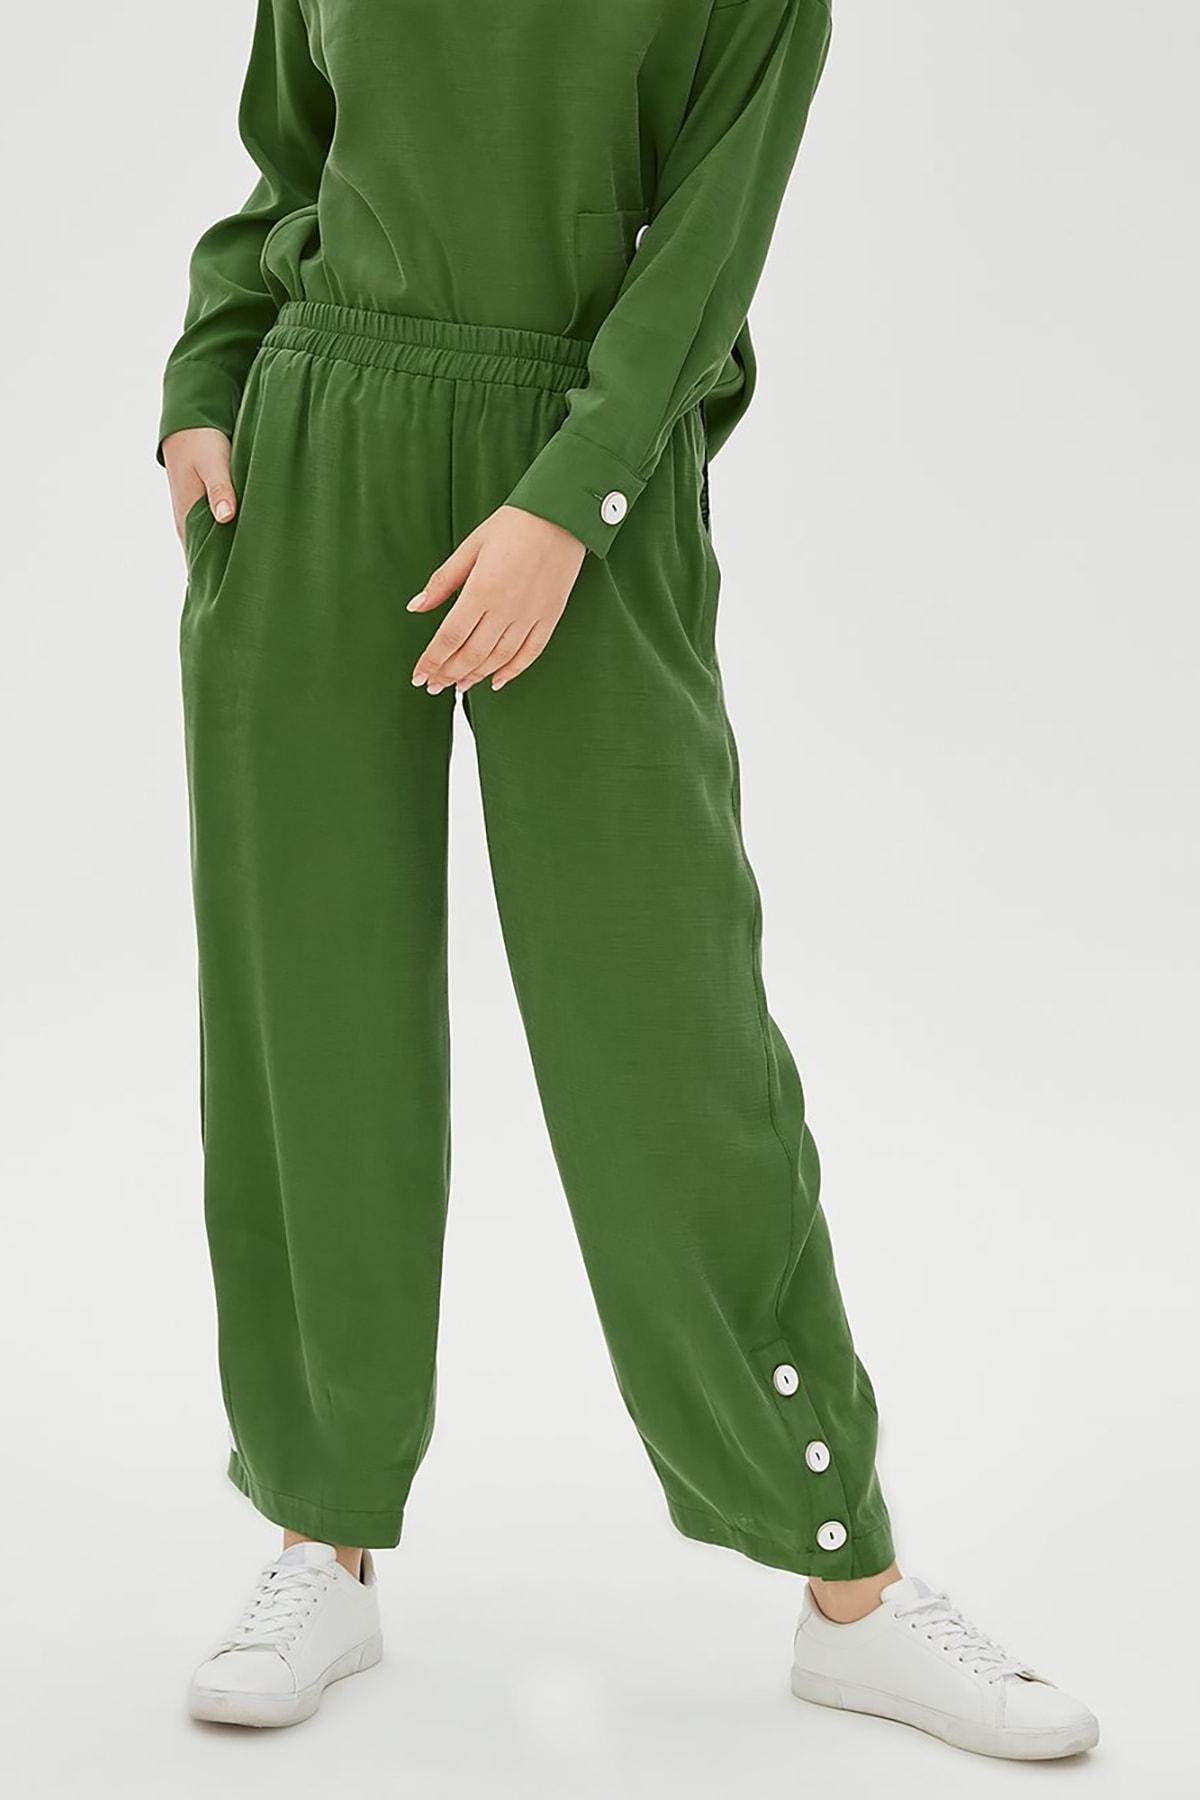 Kayra Kadın Düğme Detaylı 2'Li Takım Yeşil B20 16008